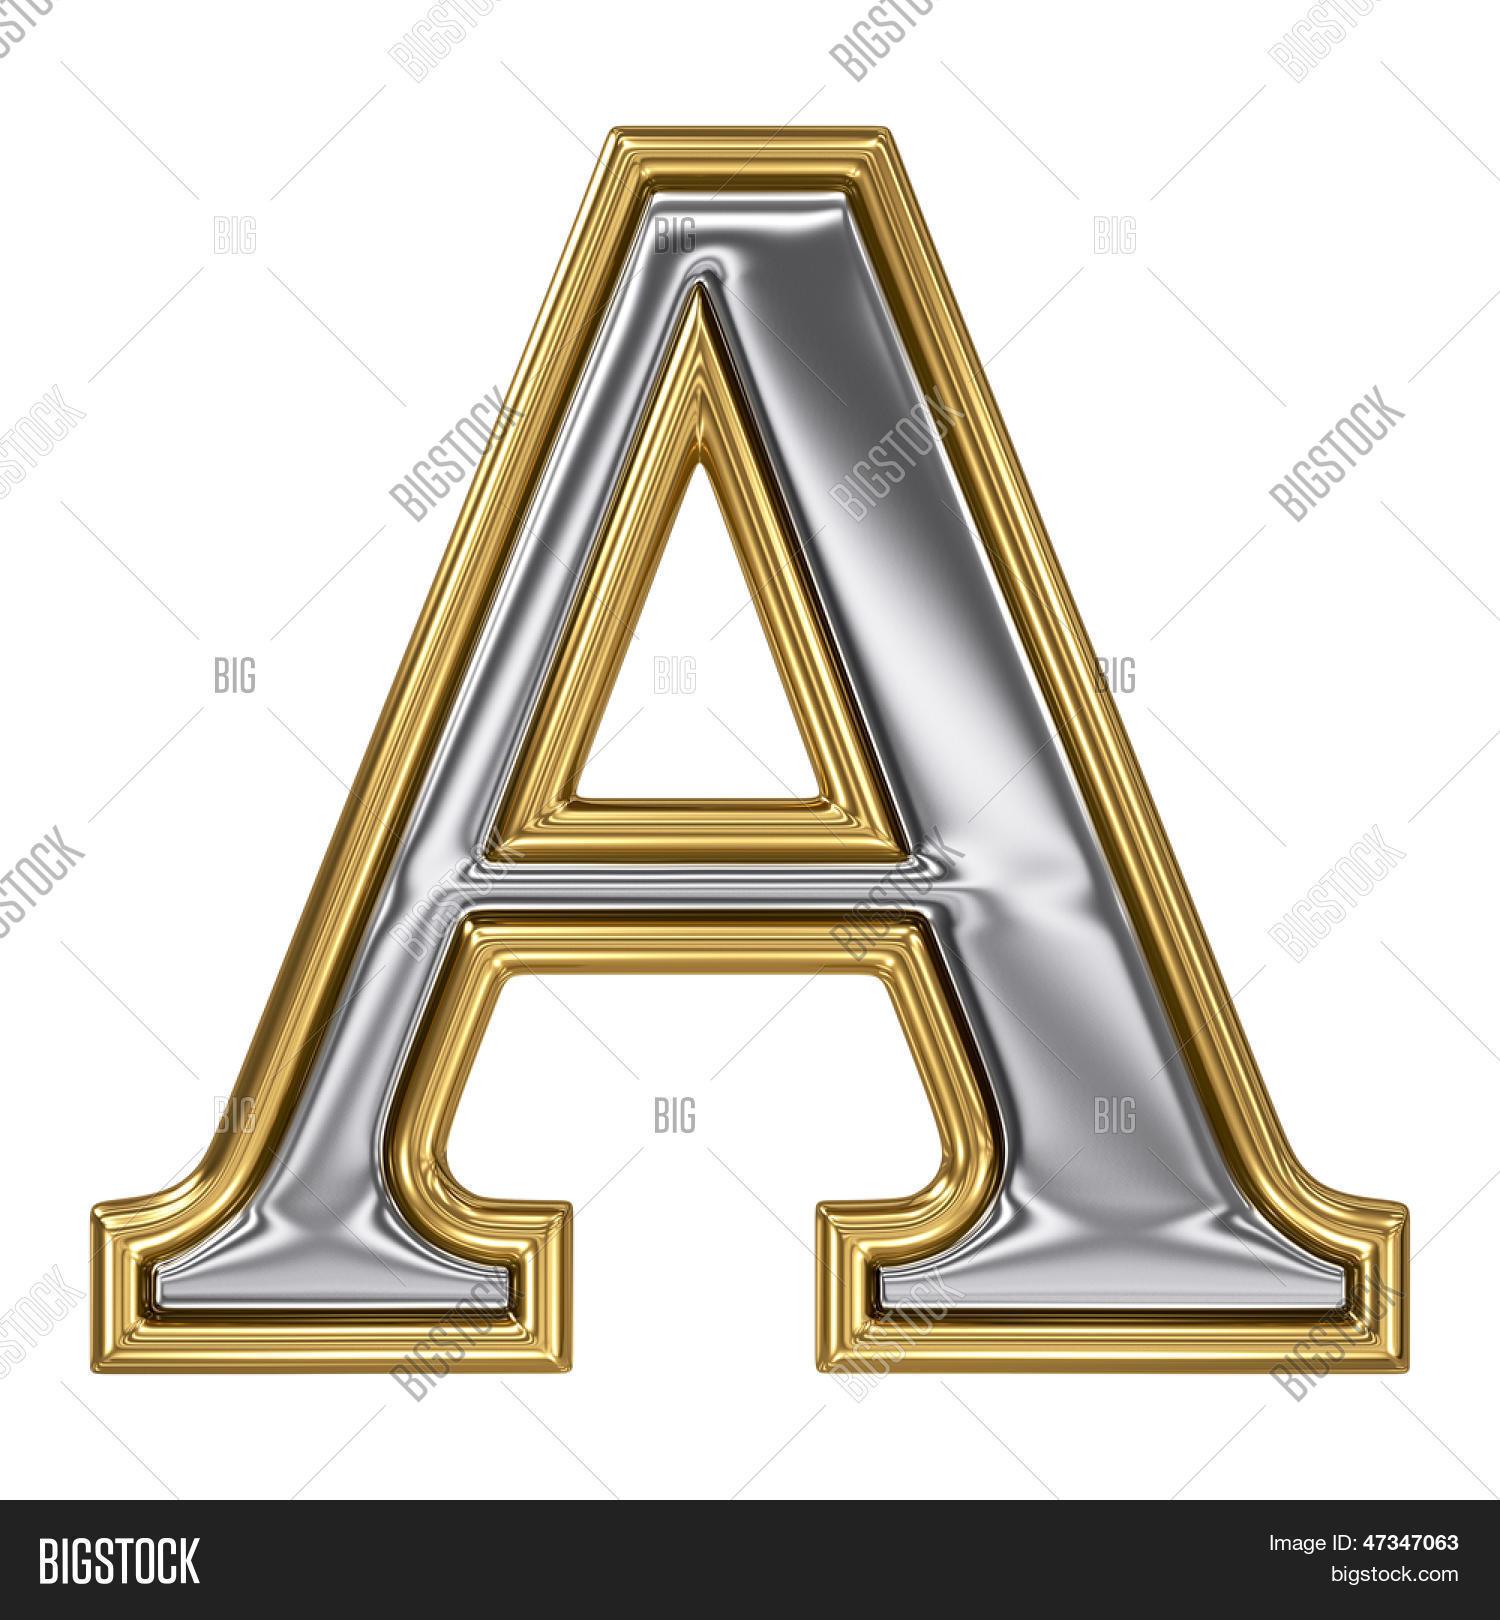 Metal Silver Gold Image Photo Free Trial Bigstock